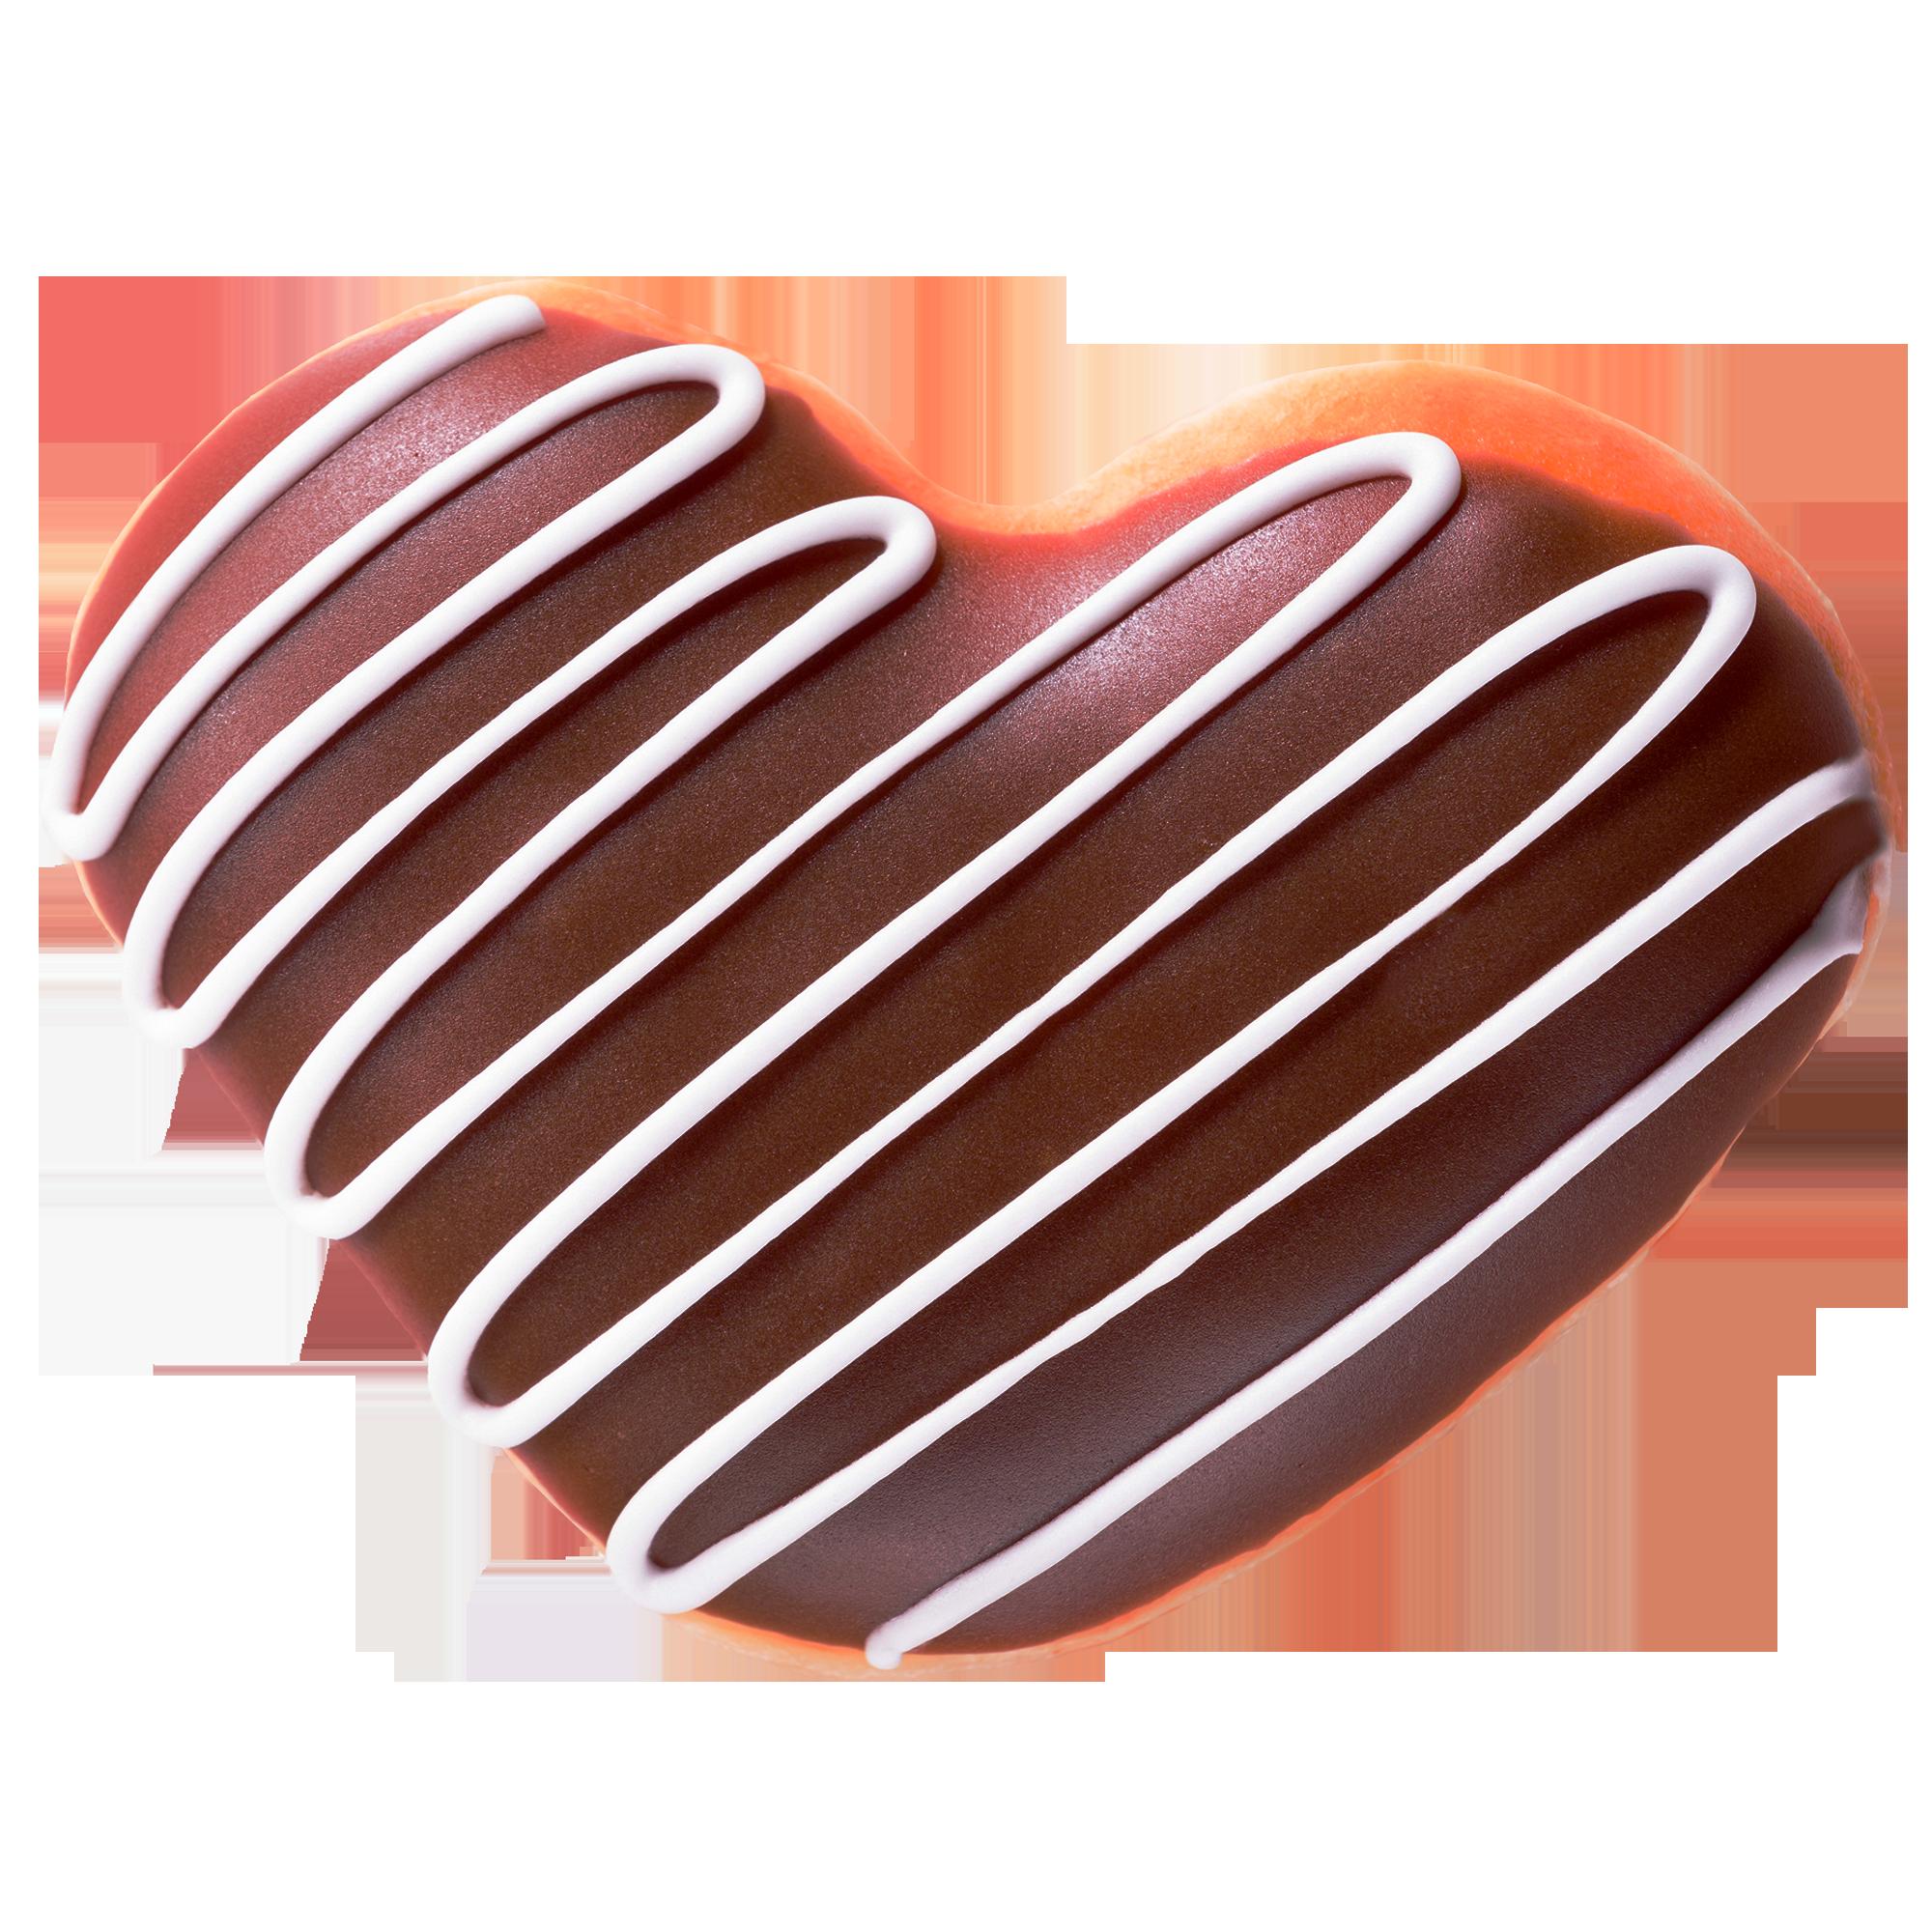 KK_dona corazón Arándanos